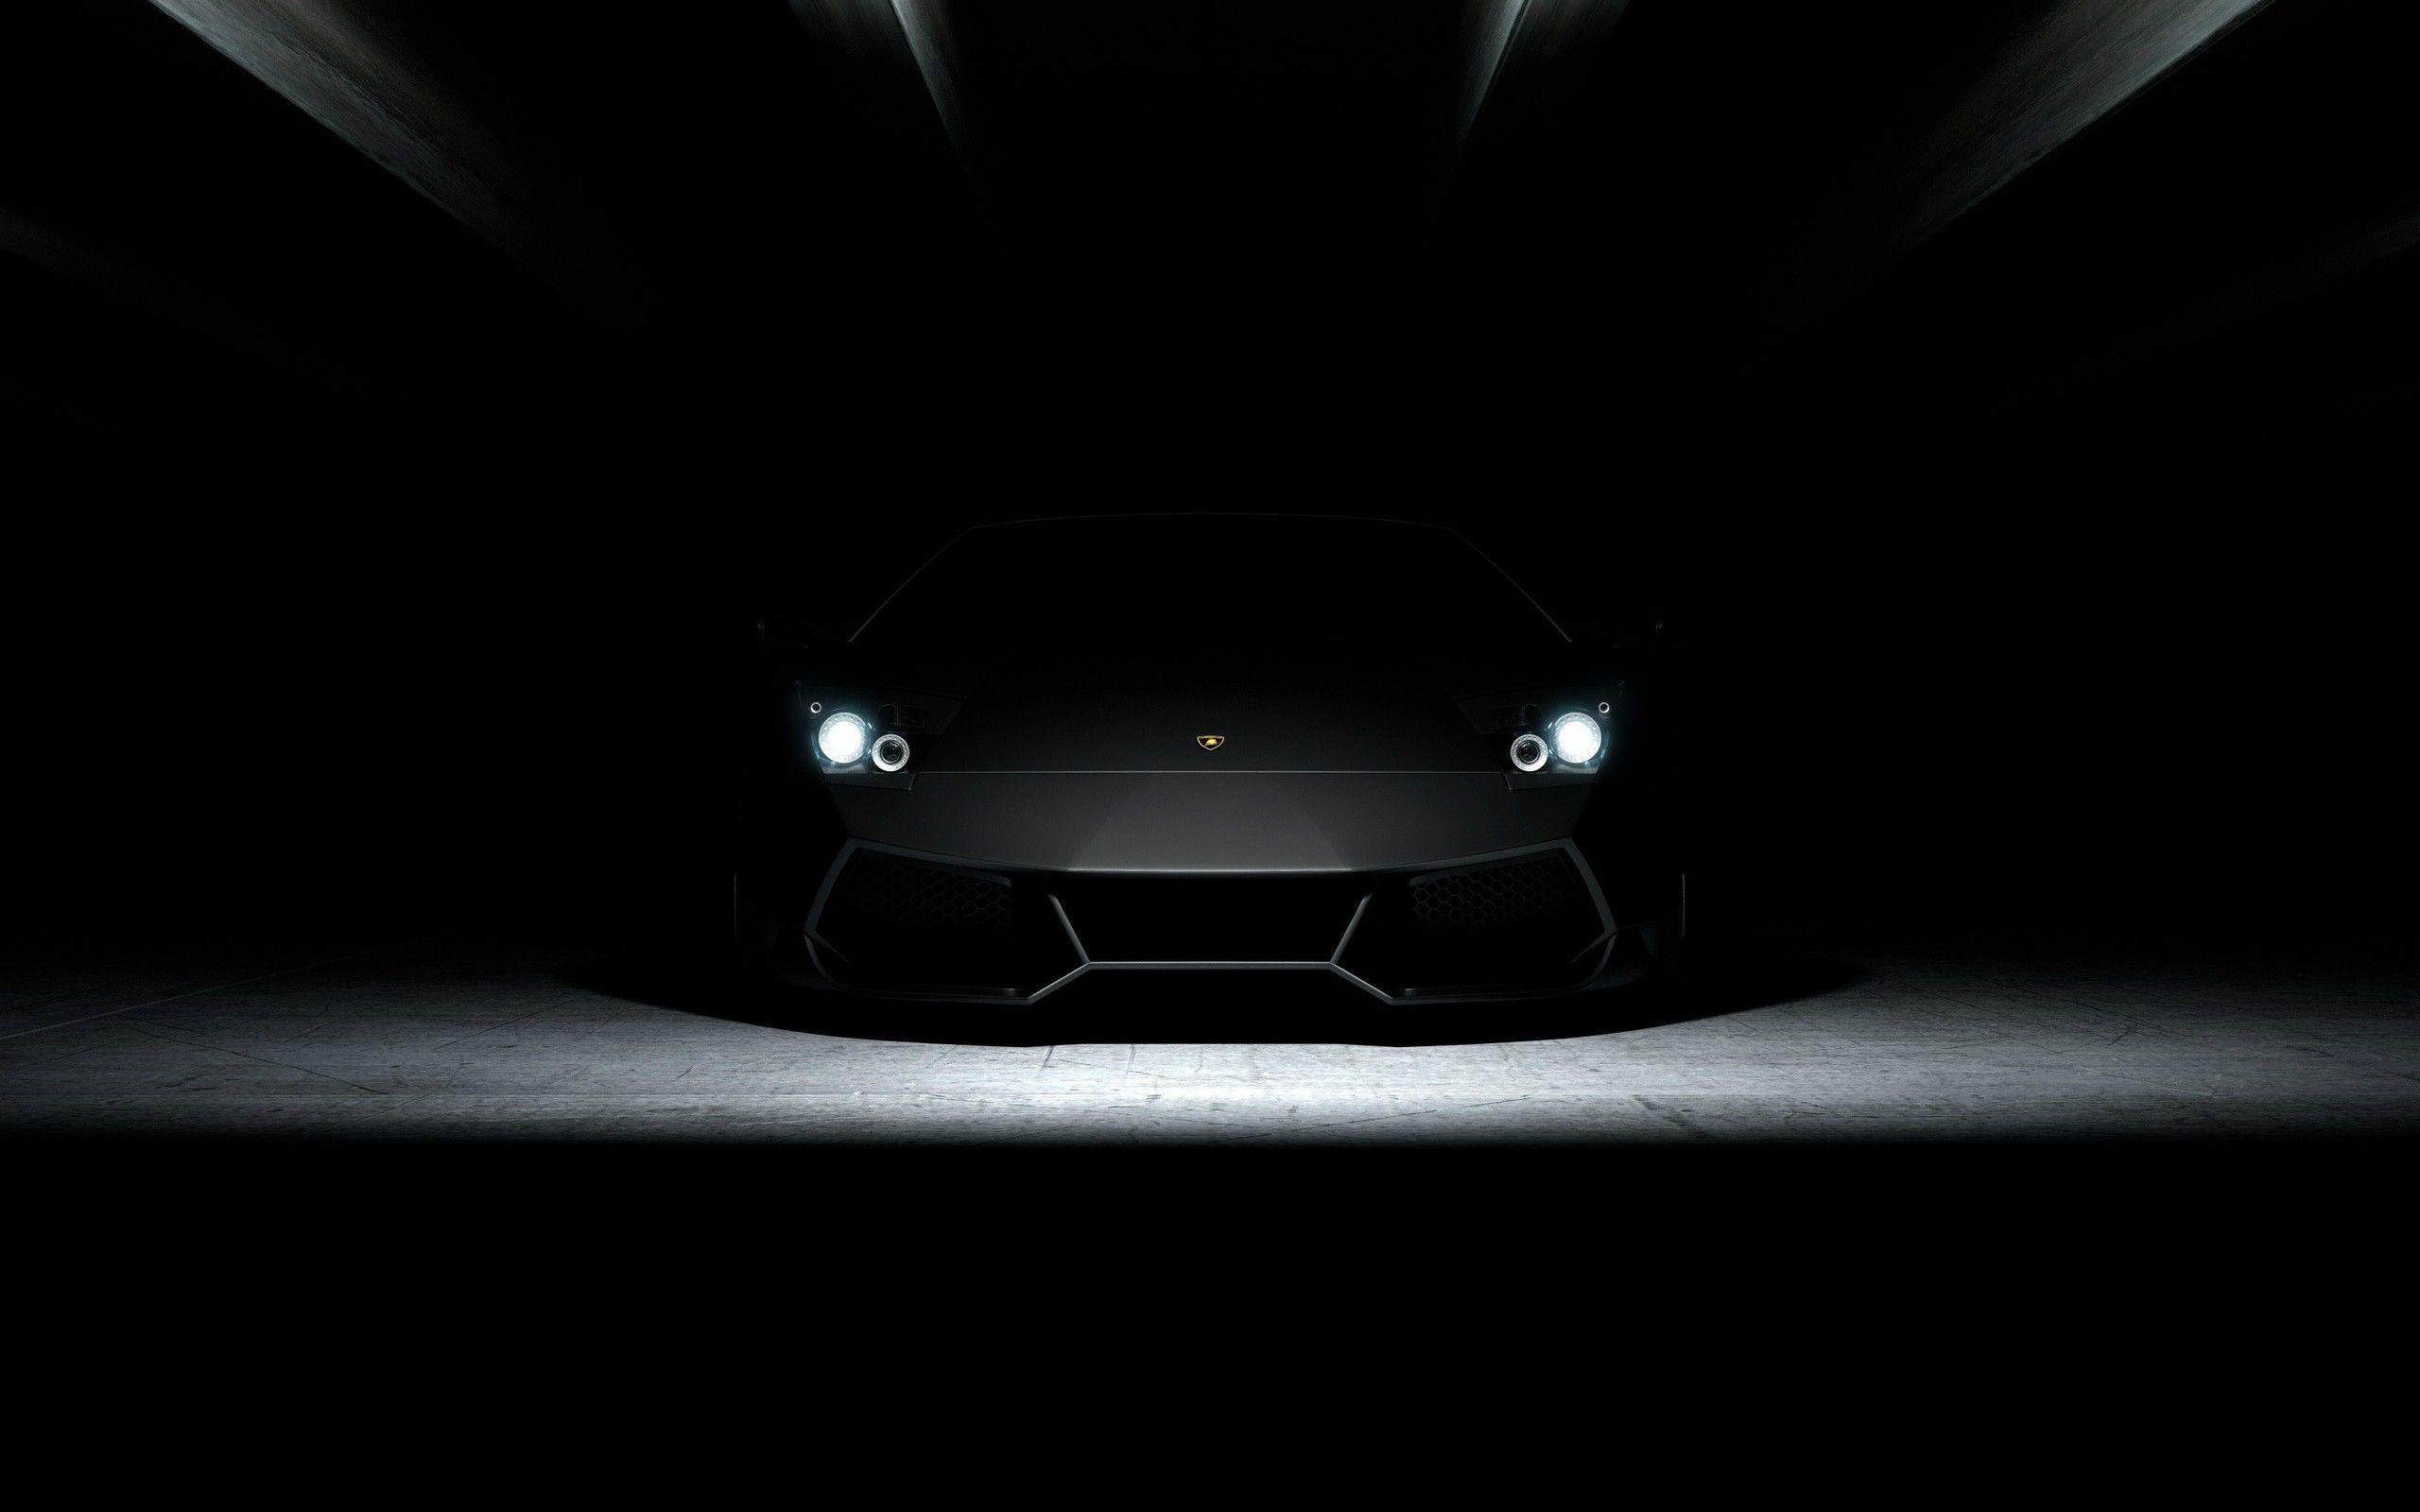 lamborghini wallpapers 1080p wallpaper cave - Lamborghini Huracan Hd Wallpapers 1080p